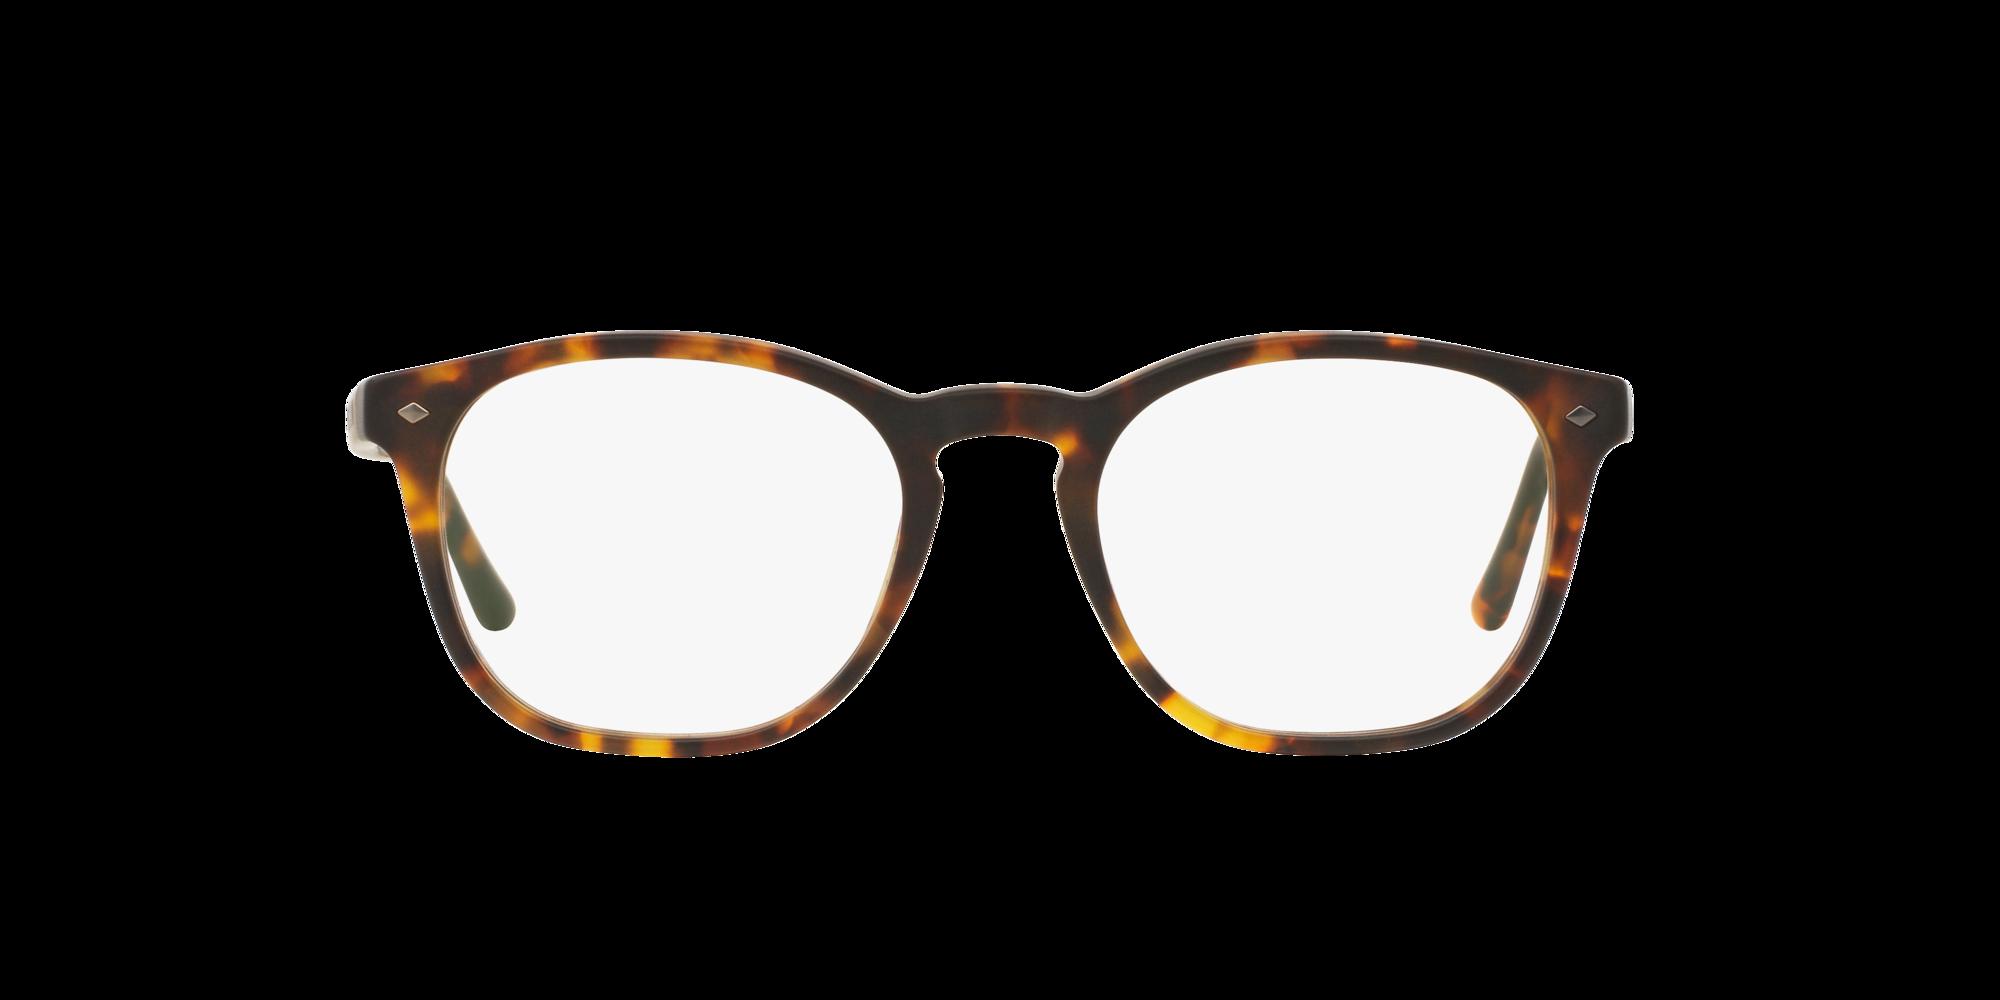 Image for AR7074 from LensCrafters | Glasses, Prescription Glasses Online, Eyewear